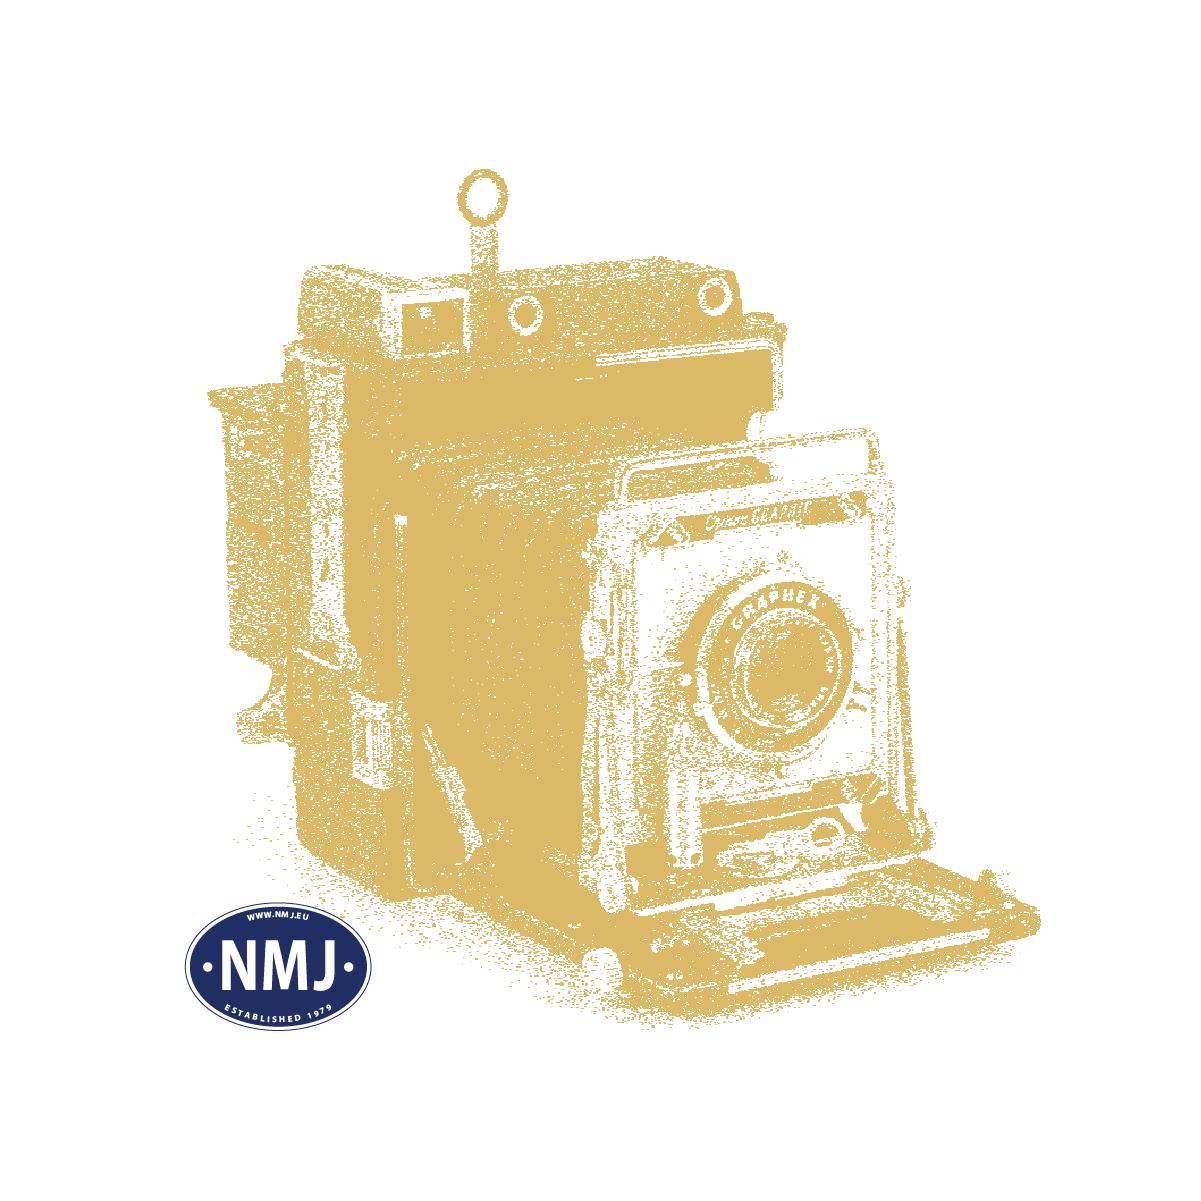 NMJT504.402 - NMJ Topline NSB His 210 2 650-9, type 4